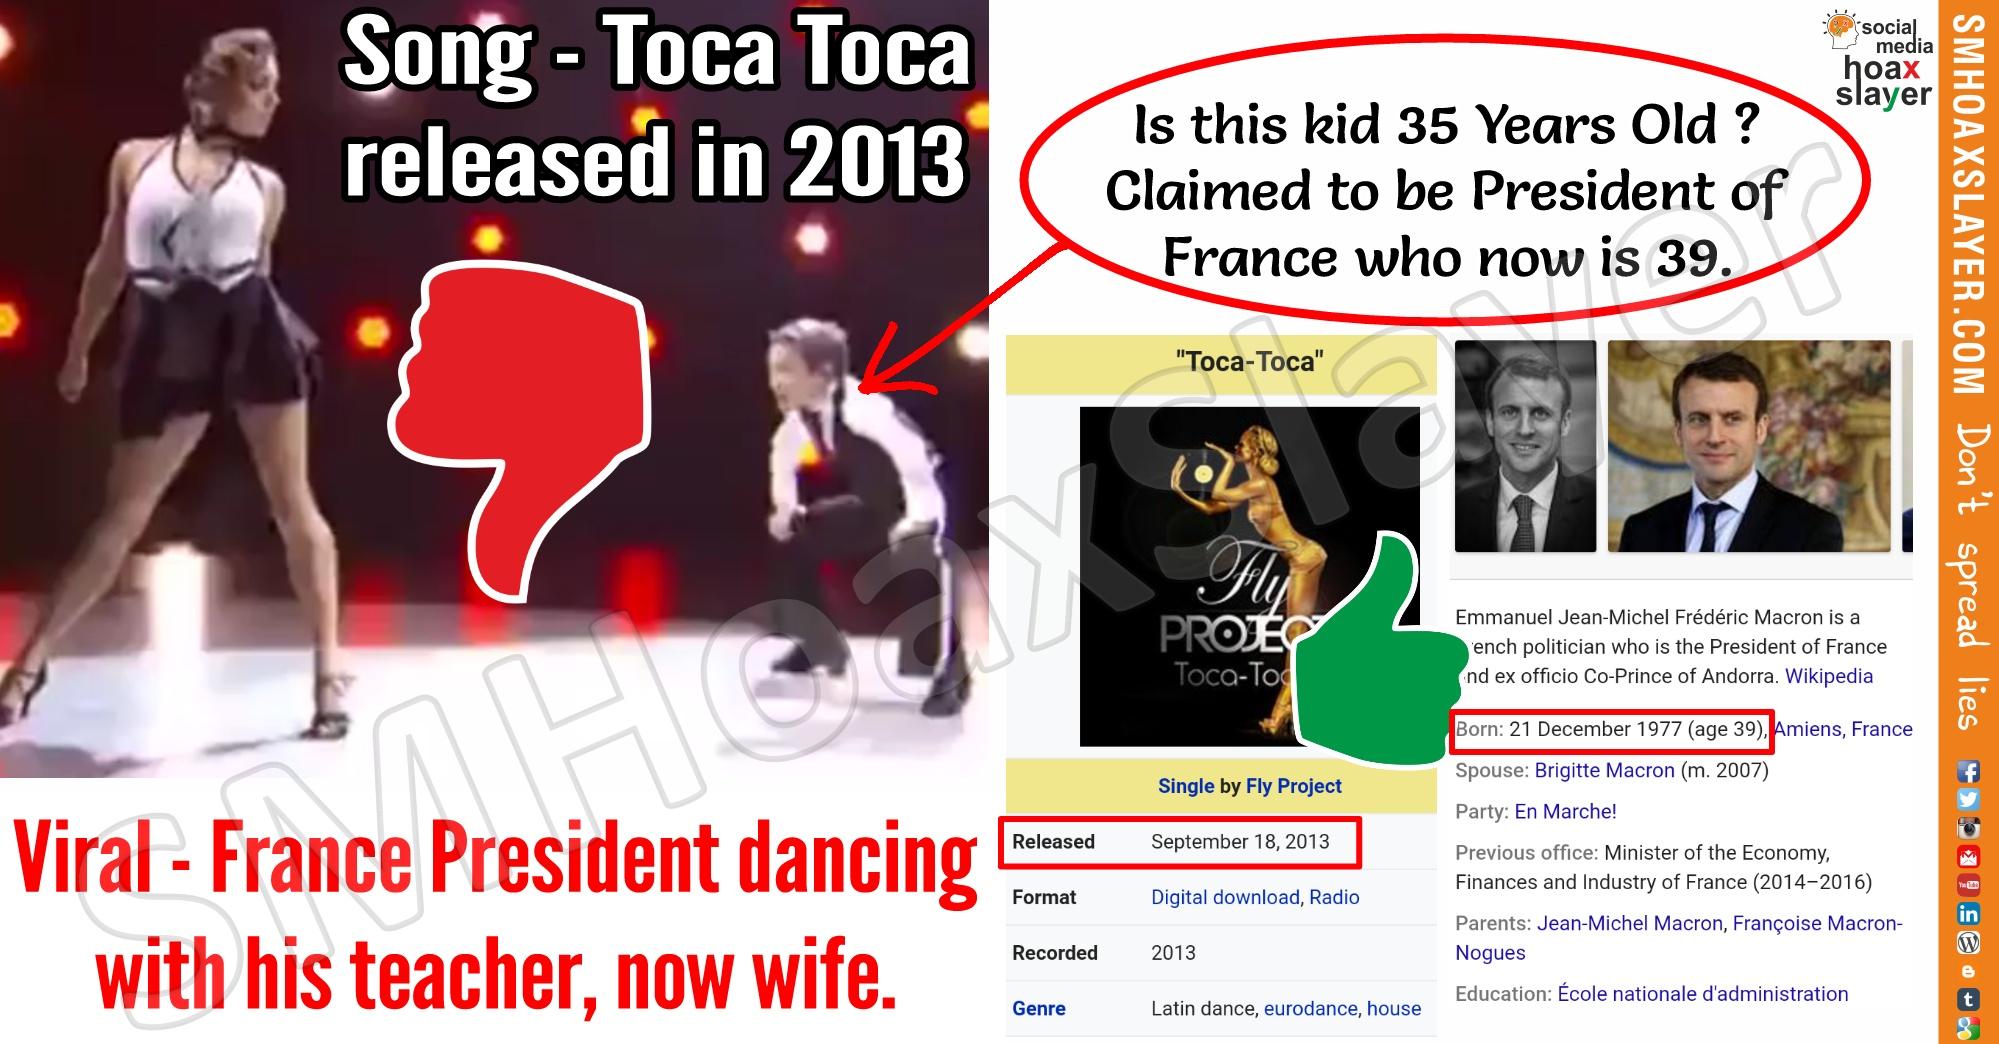 Did France President Macron as kid 'Tango'ed with his Teacher, now wife ? -  :: SM Hoax Slayer :: Swachh Social Media Abhiyaan